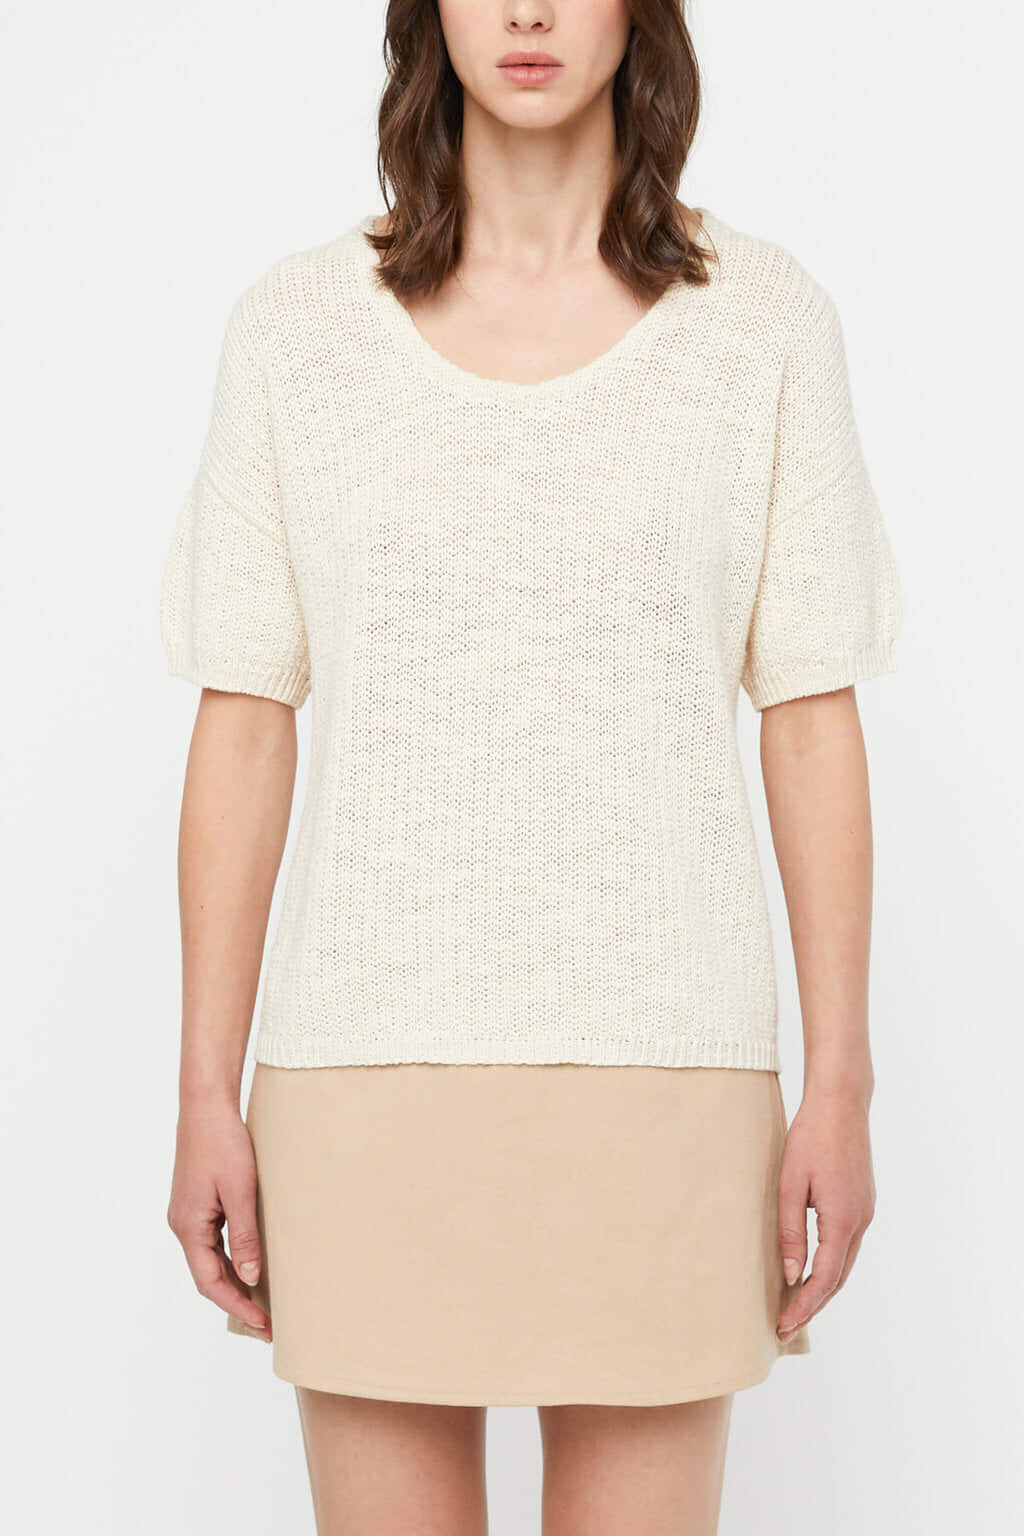 Sweater 3247 Cream 2